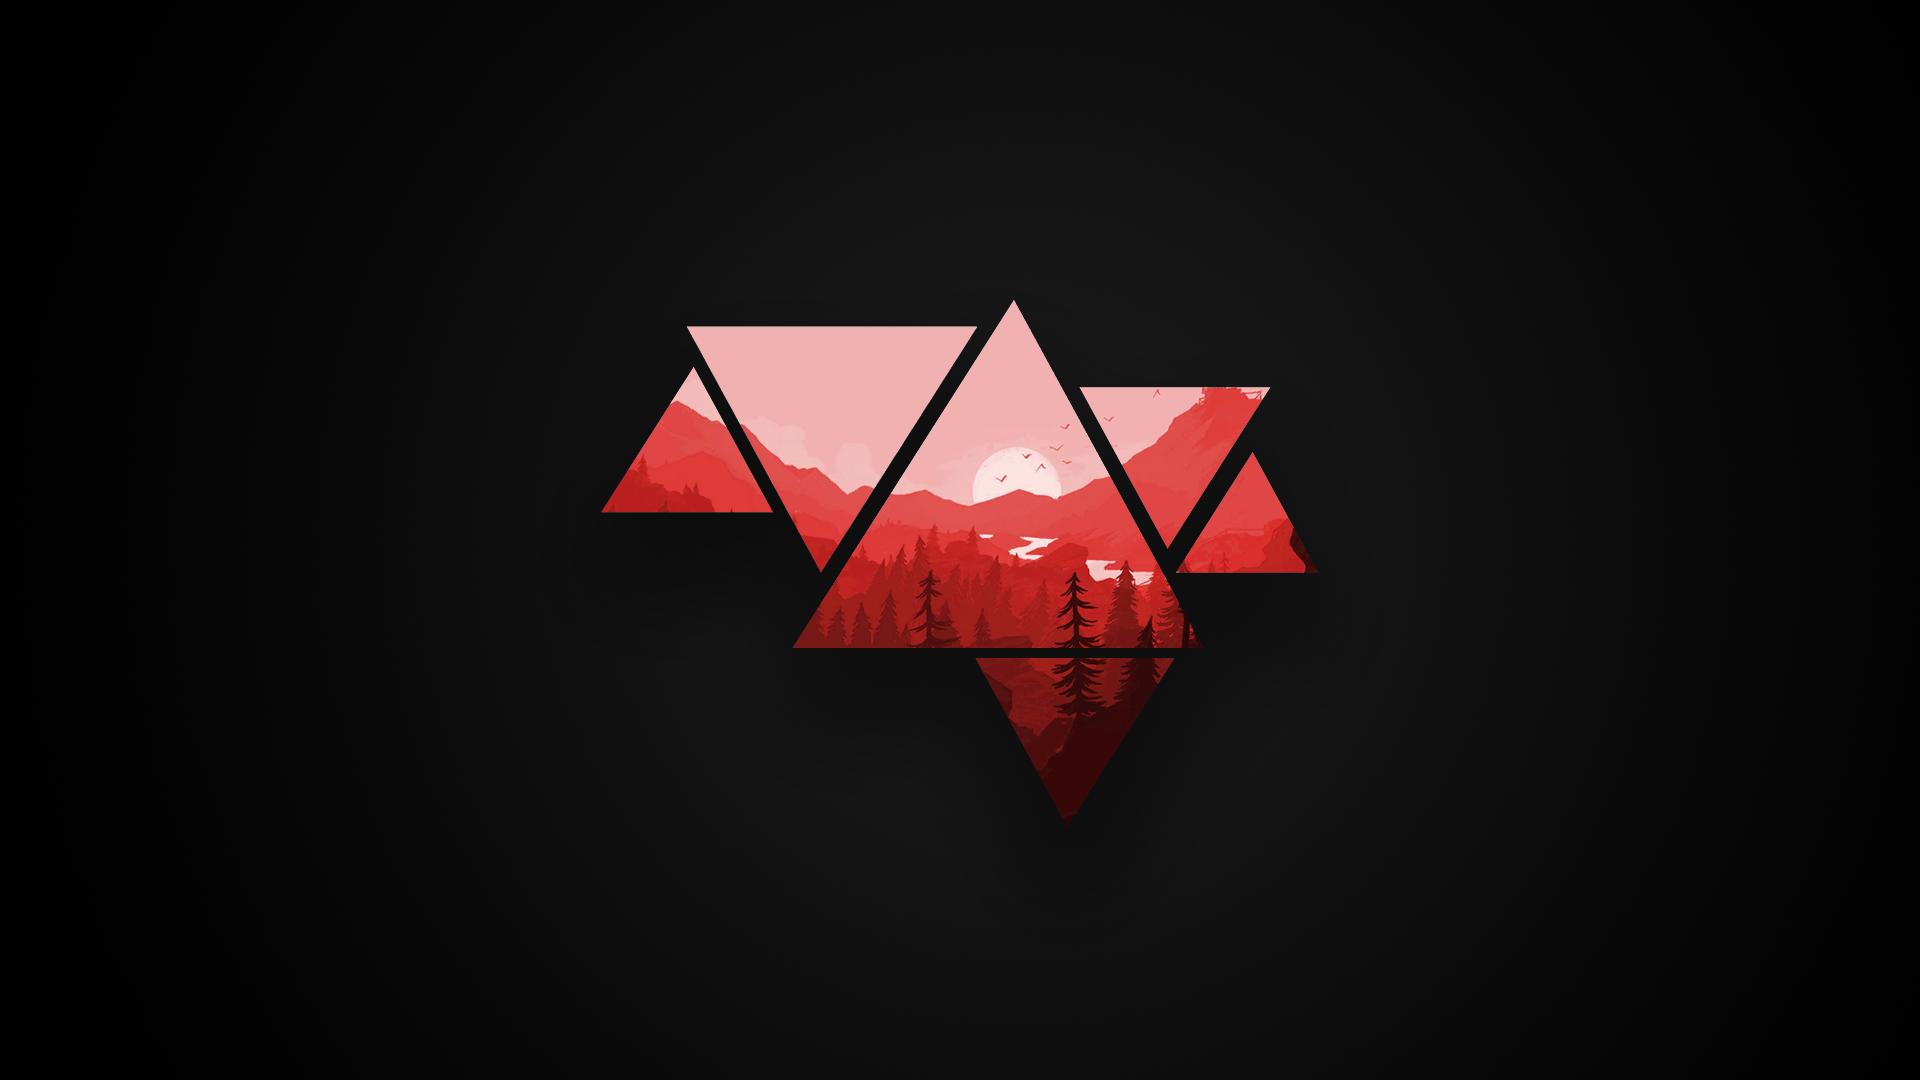 Minimalistic Mountains Red And Black Version 1920x1080 Acabamentos De Pintura Wallpaper Capa De Twitter